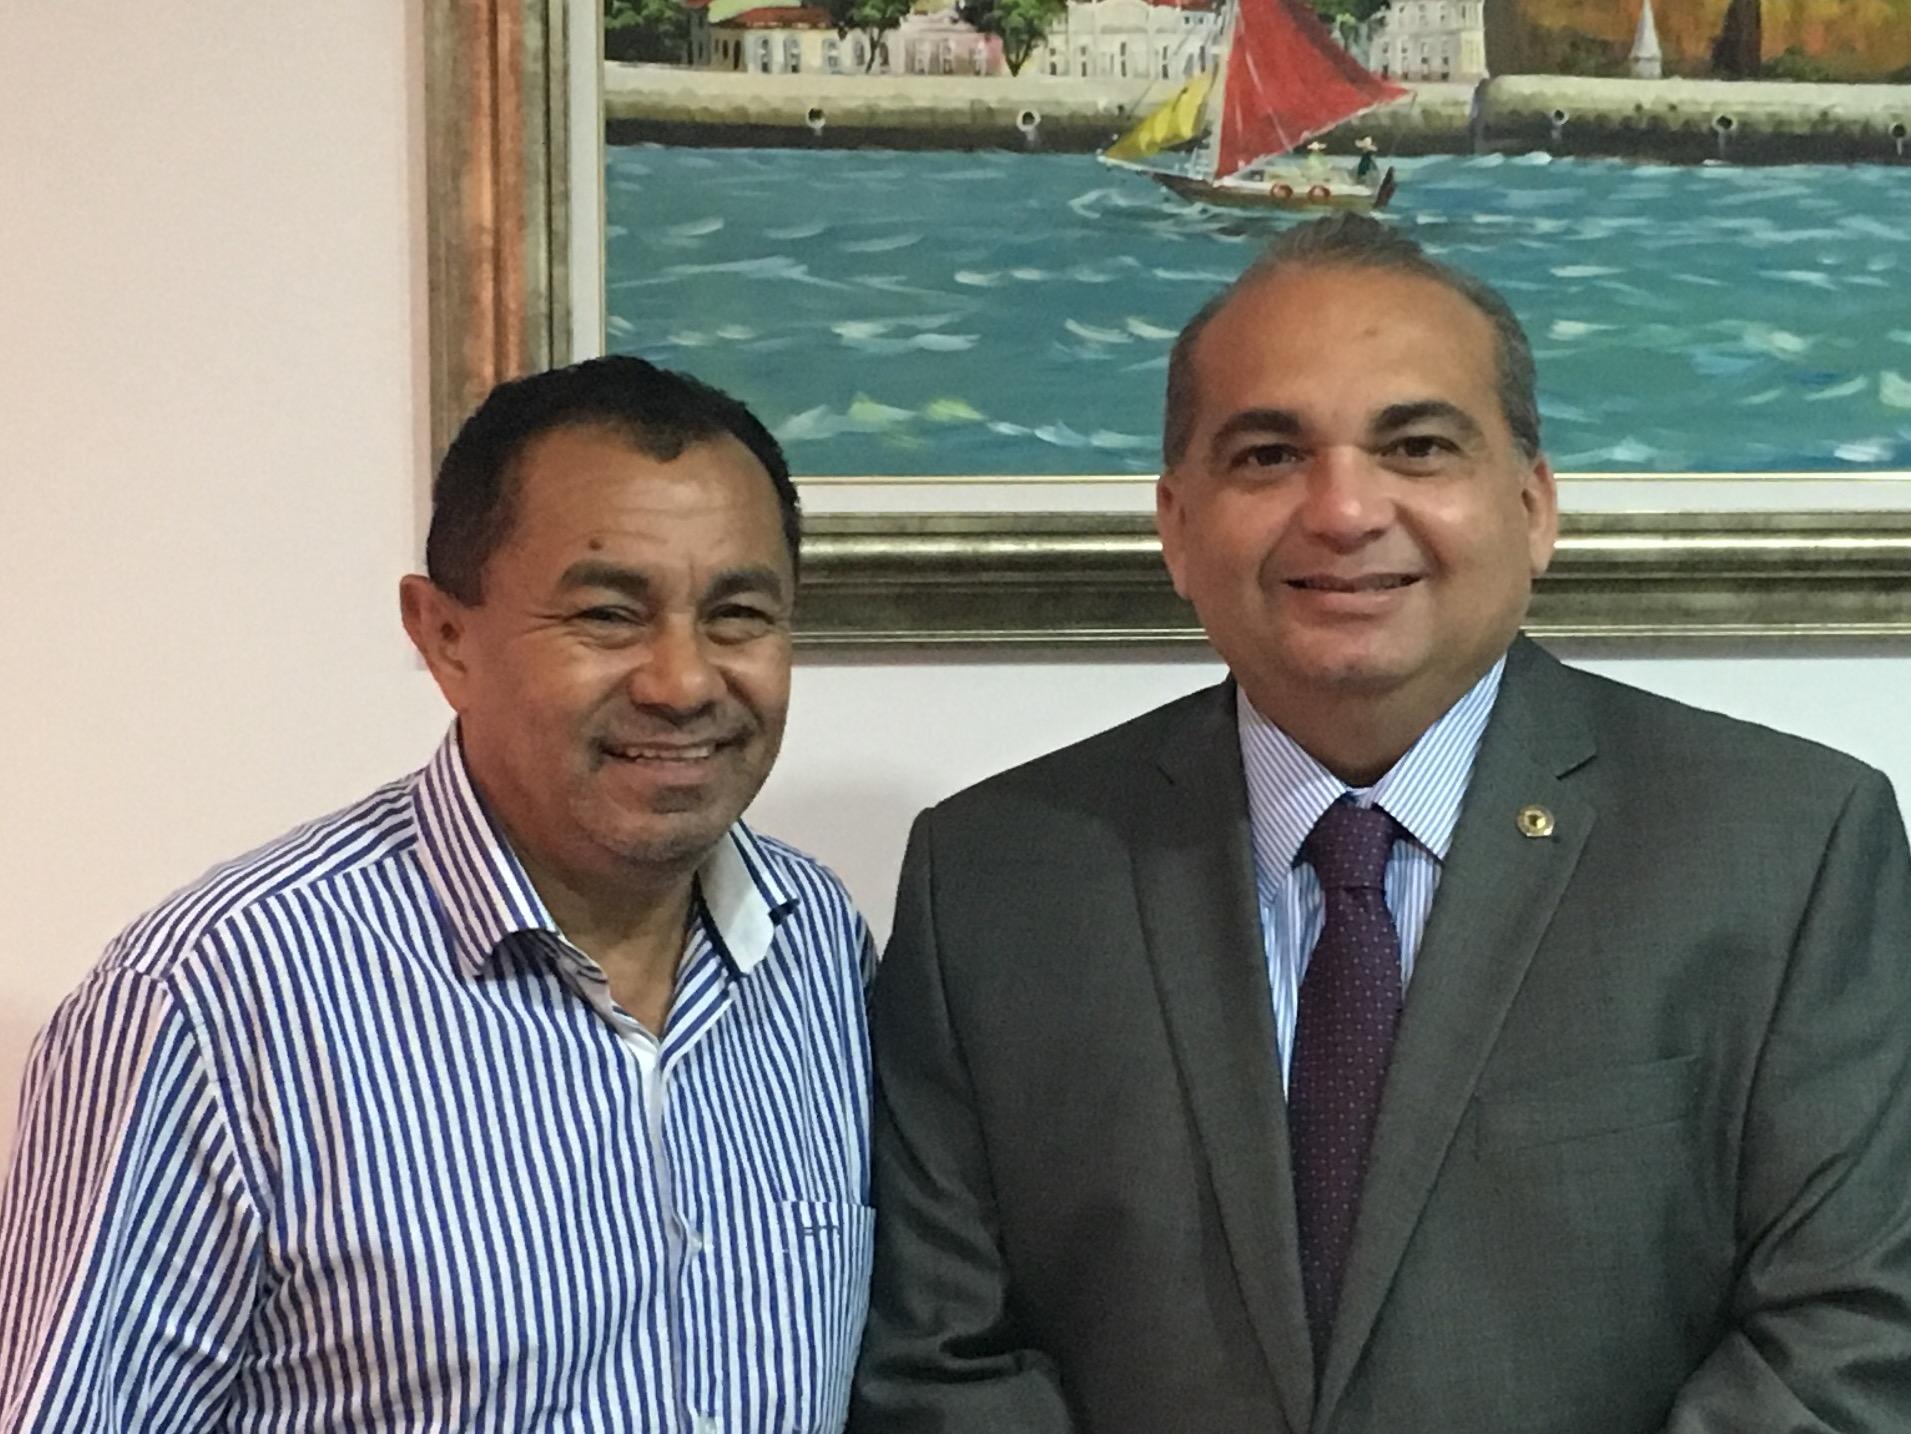 Fabio Braga e prefeito Afonso Celso